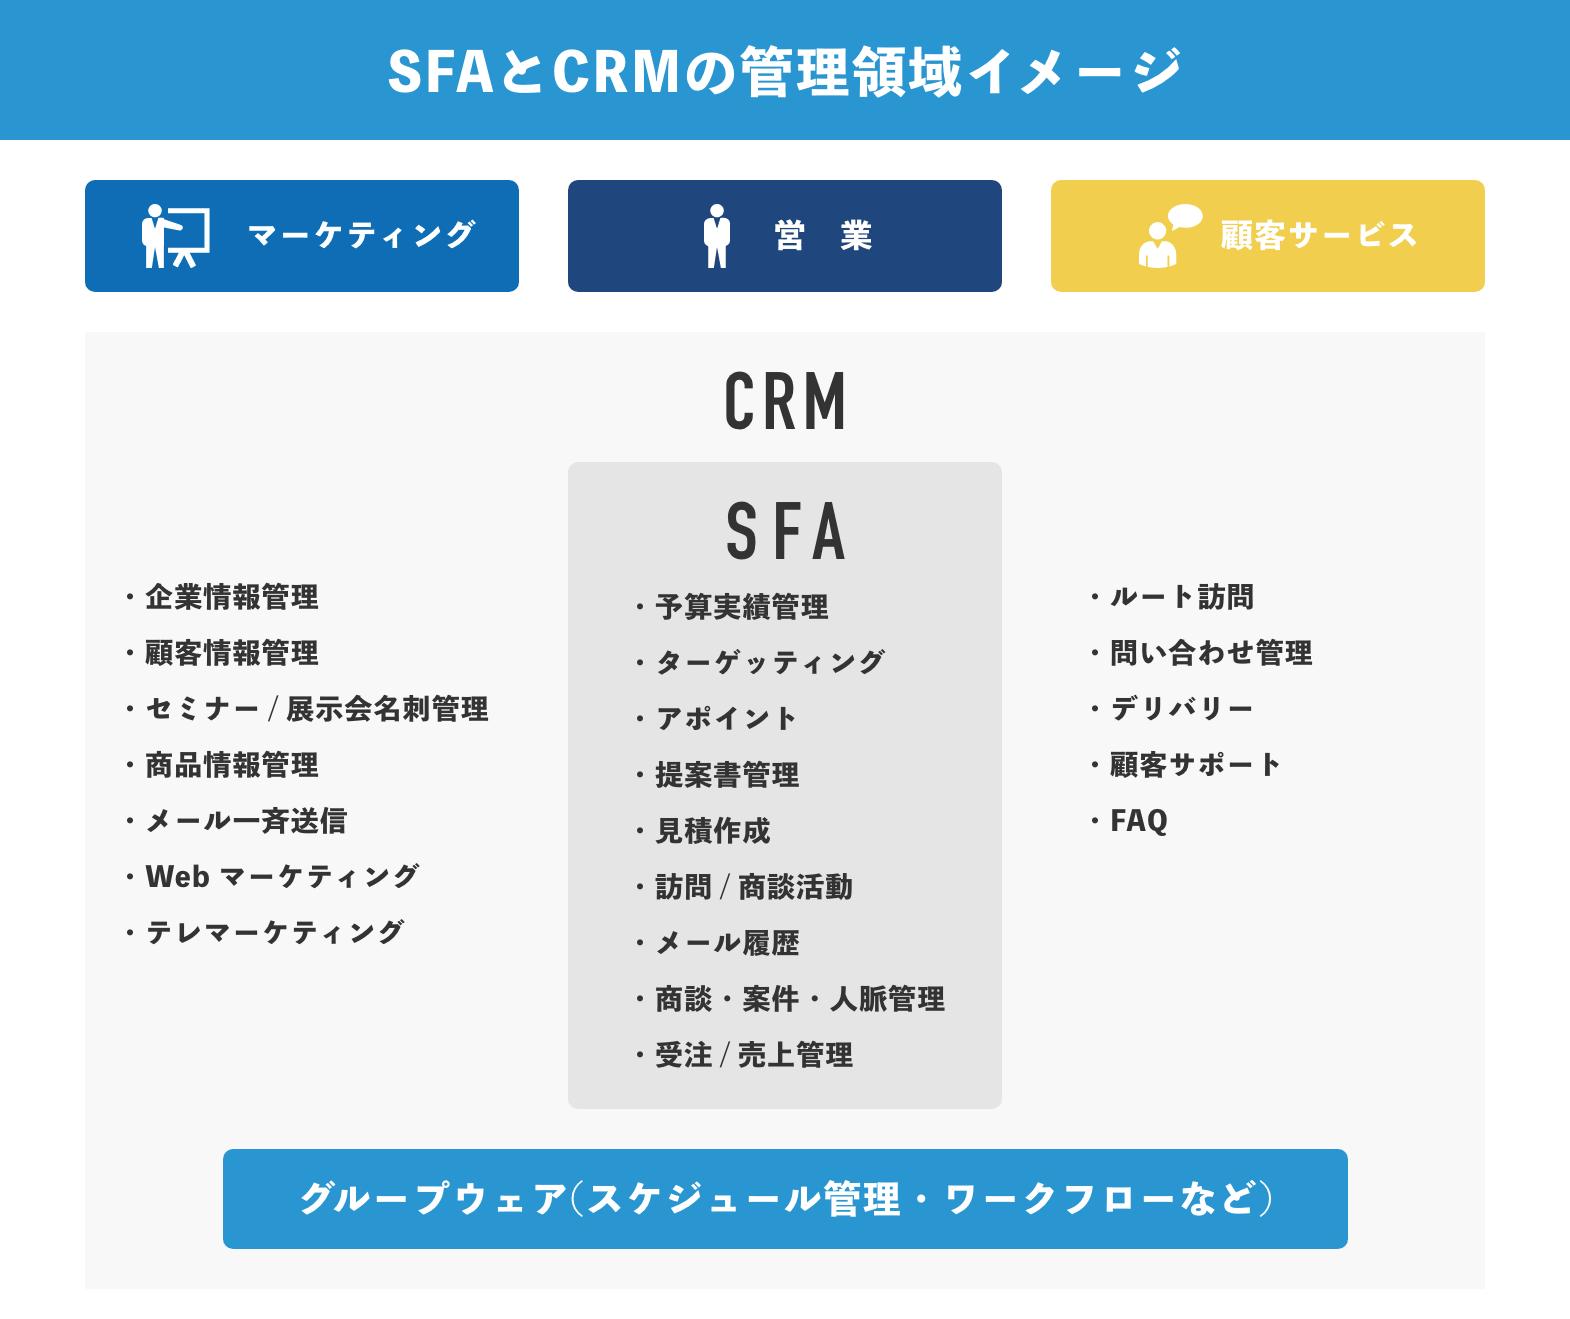 SFAとCRMの管理領域イメージ